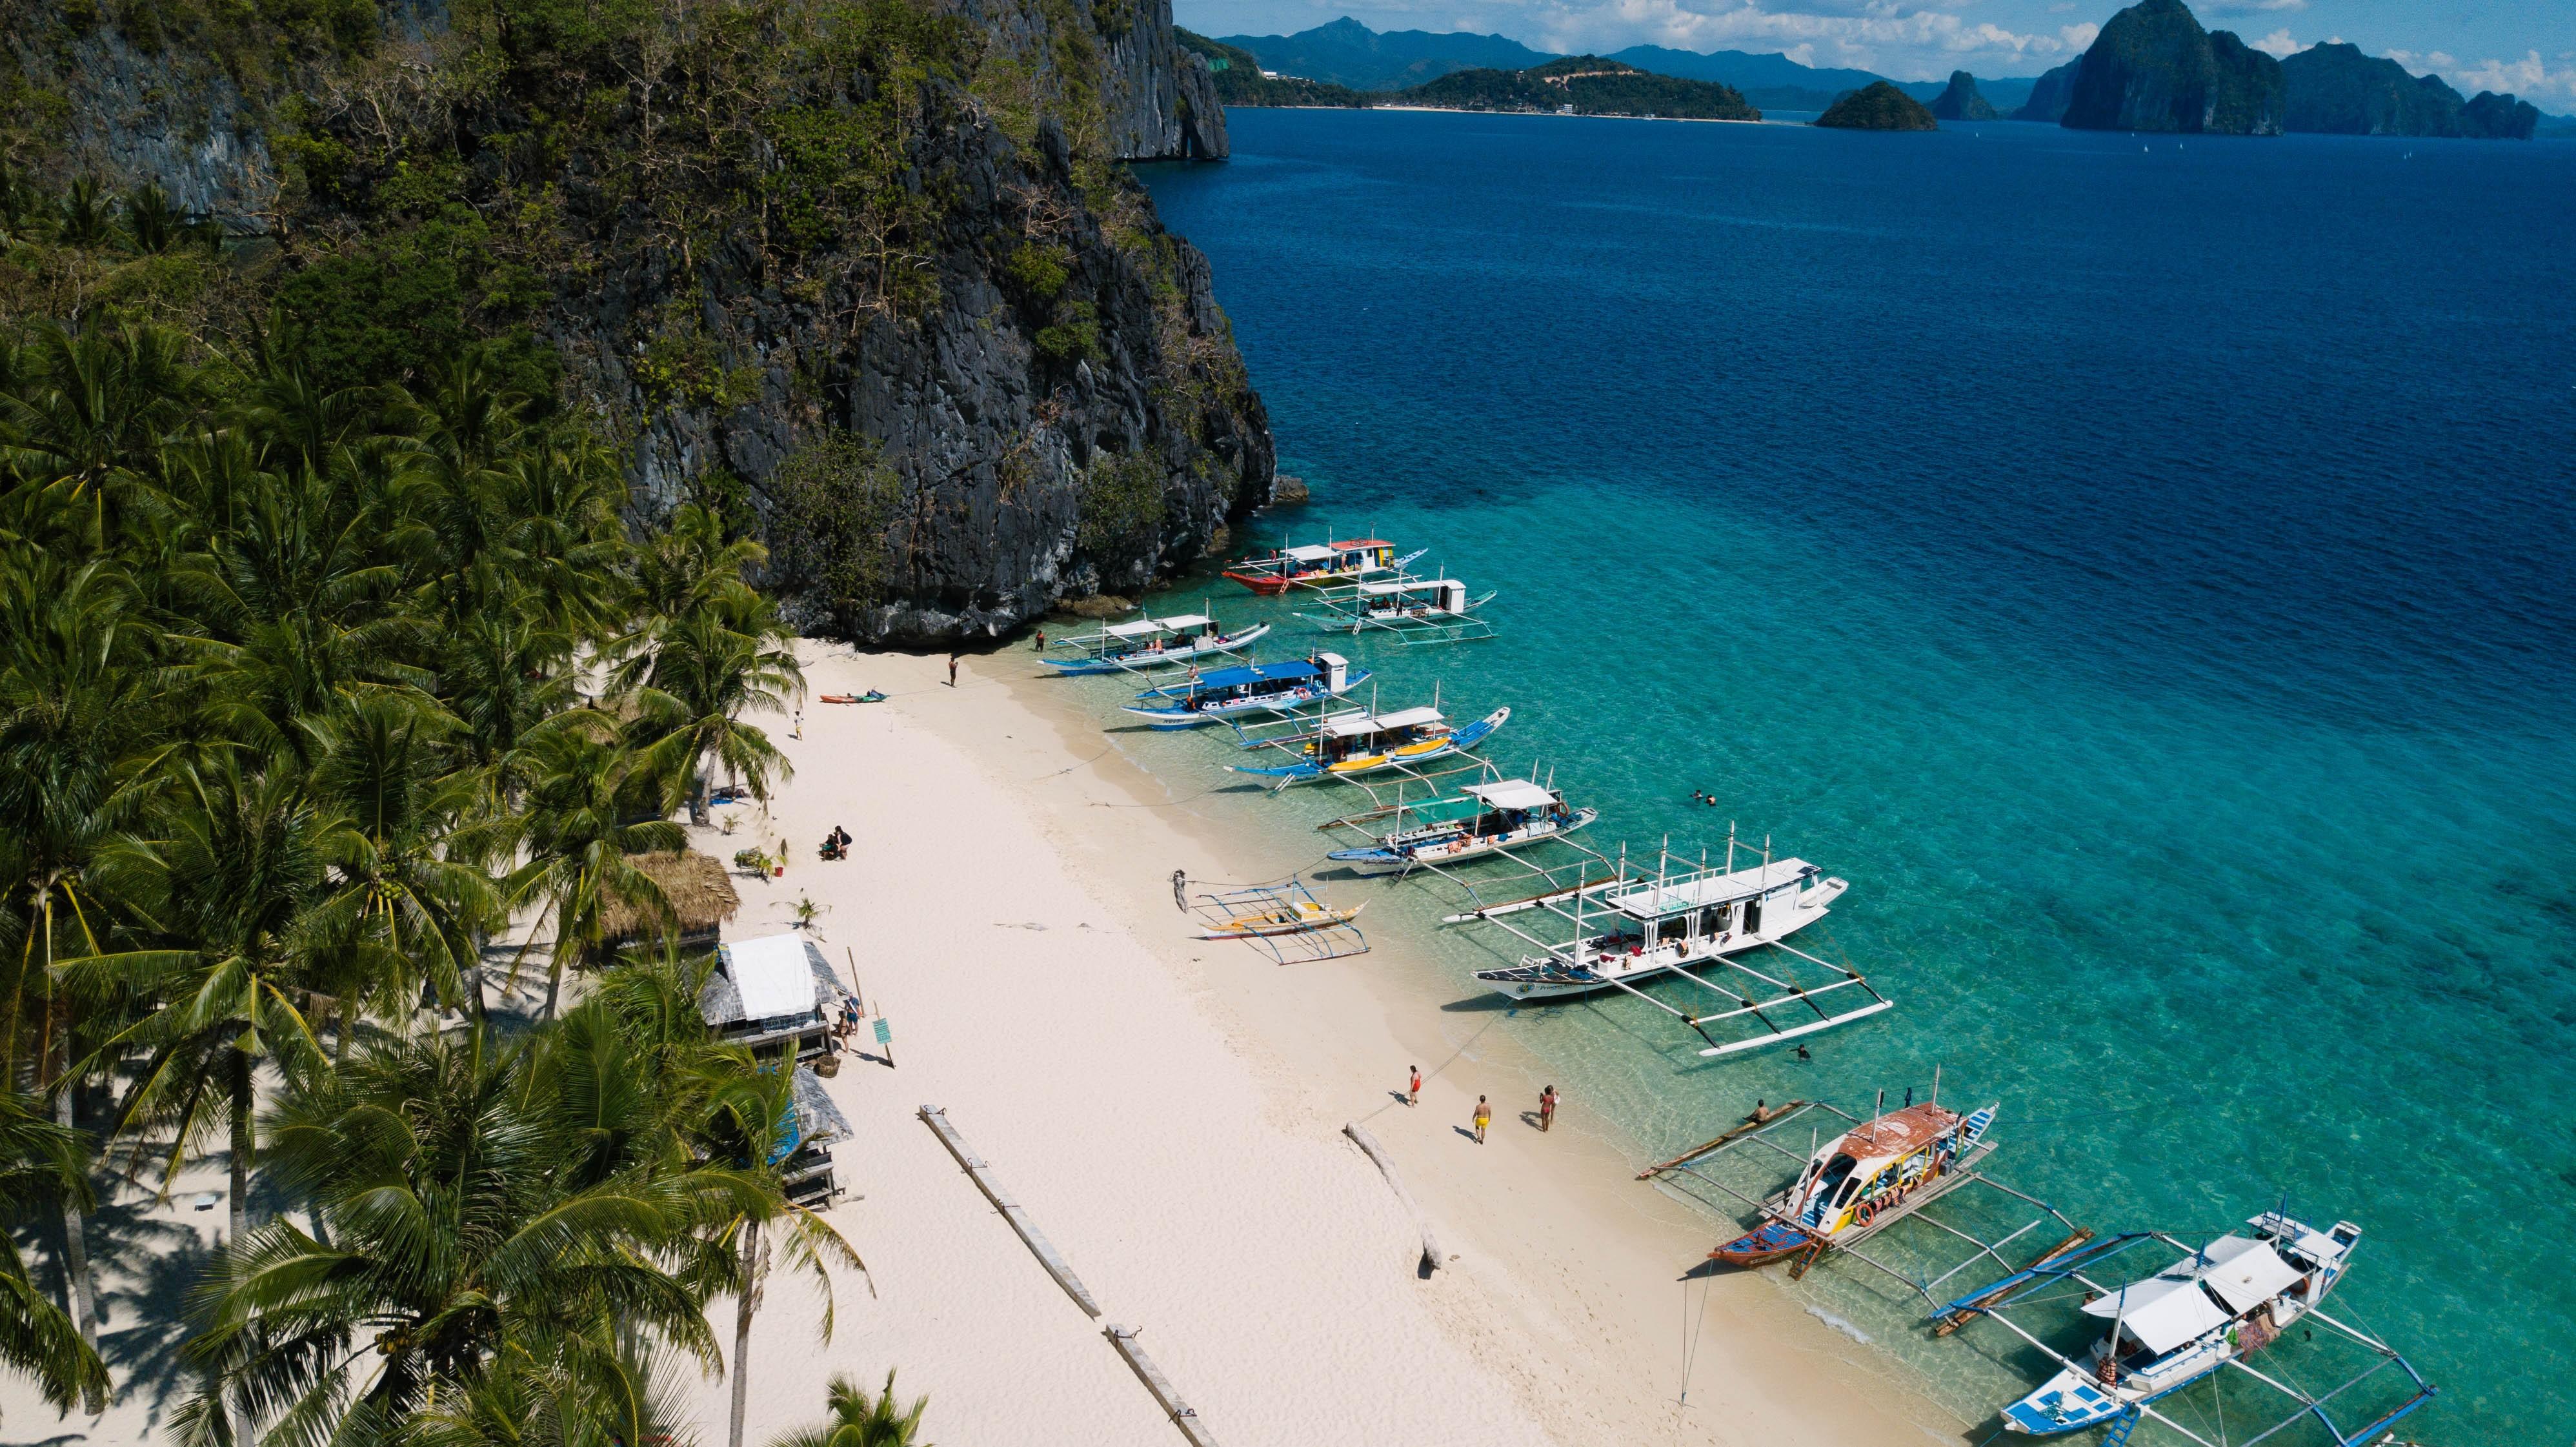 View of boats for Coron Palawan Island Hopping Tour A